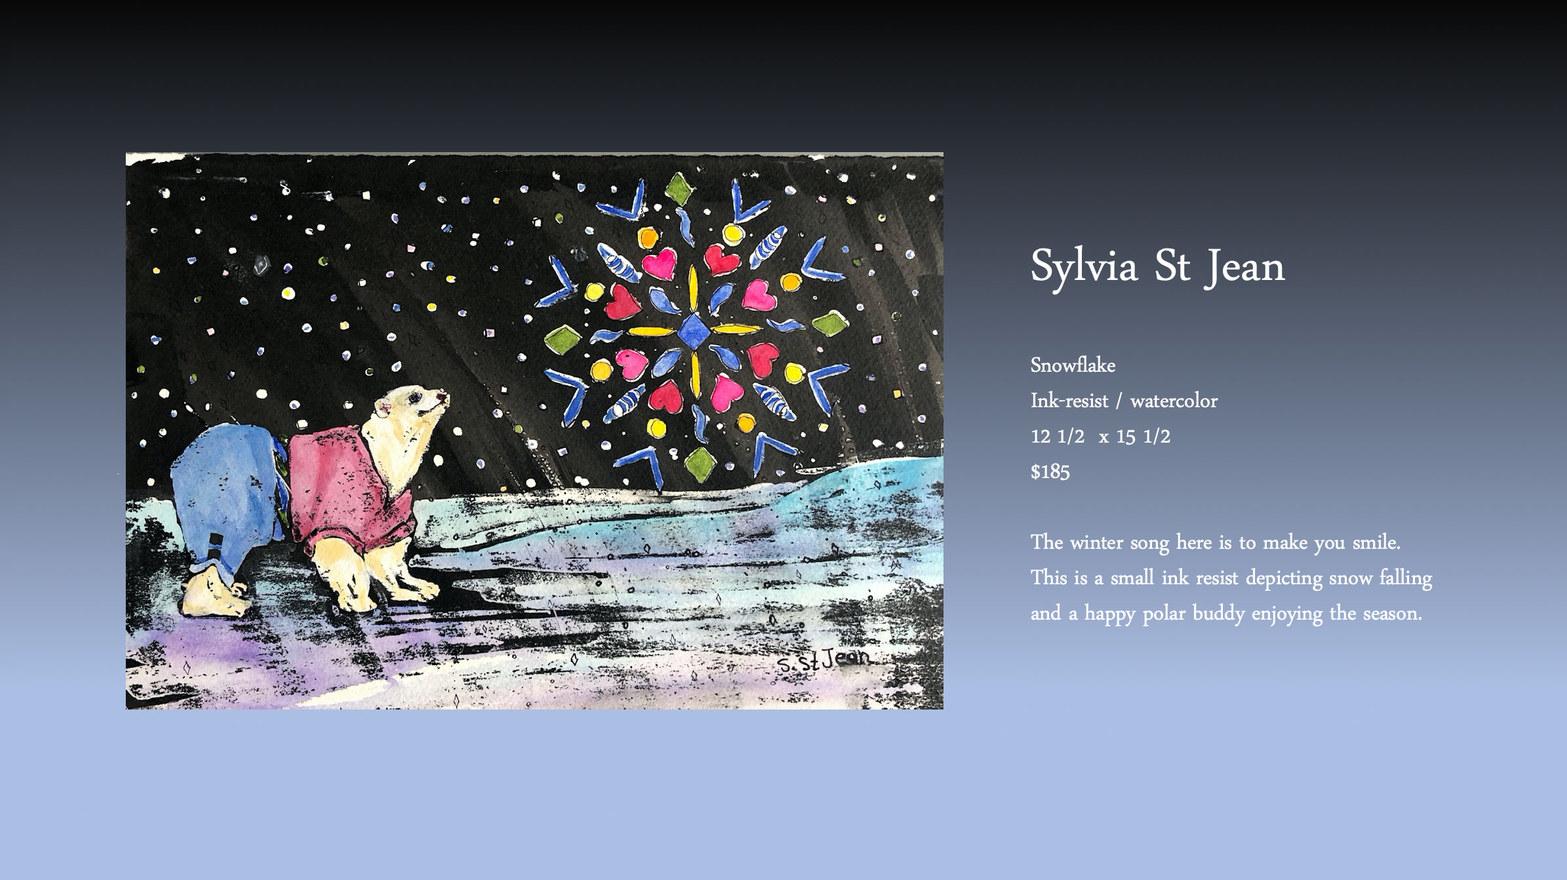 Sylvia St Jean